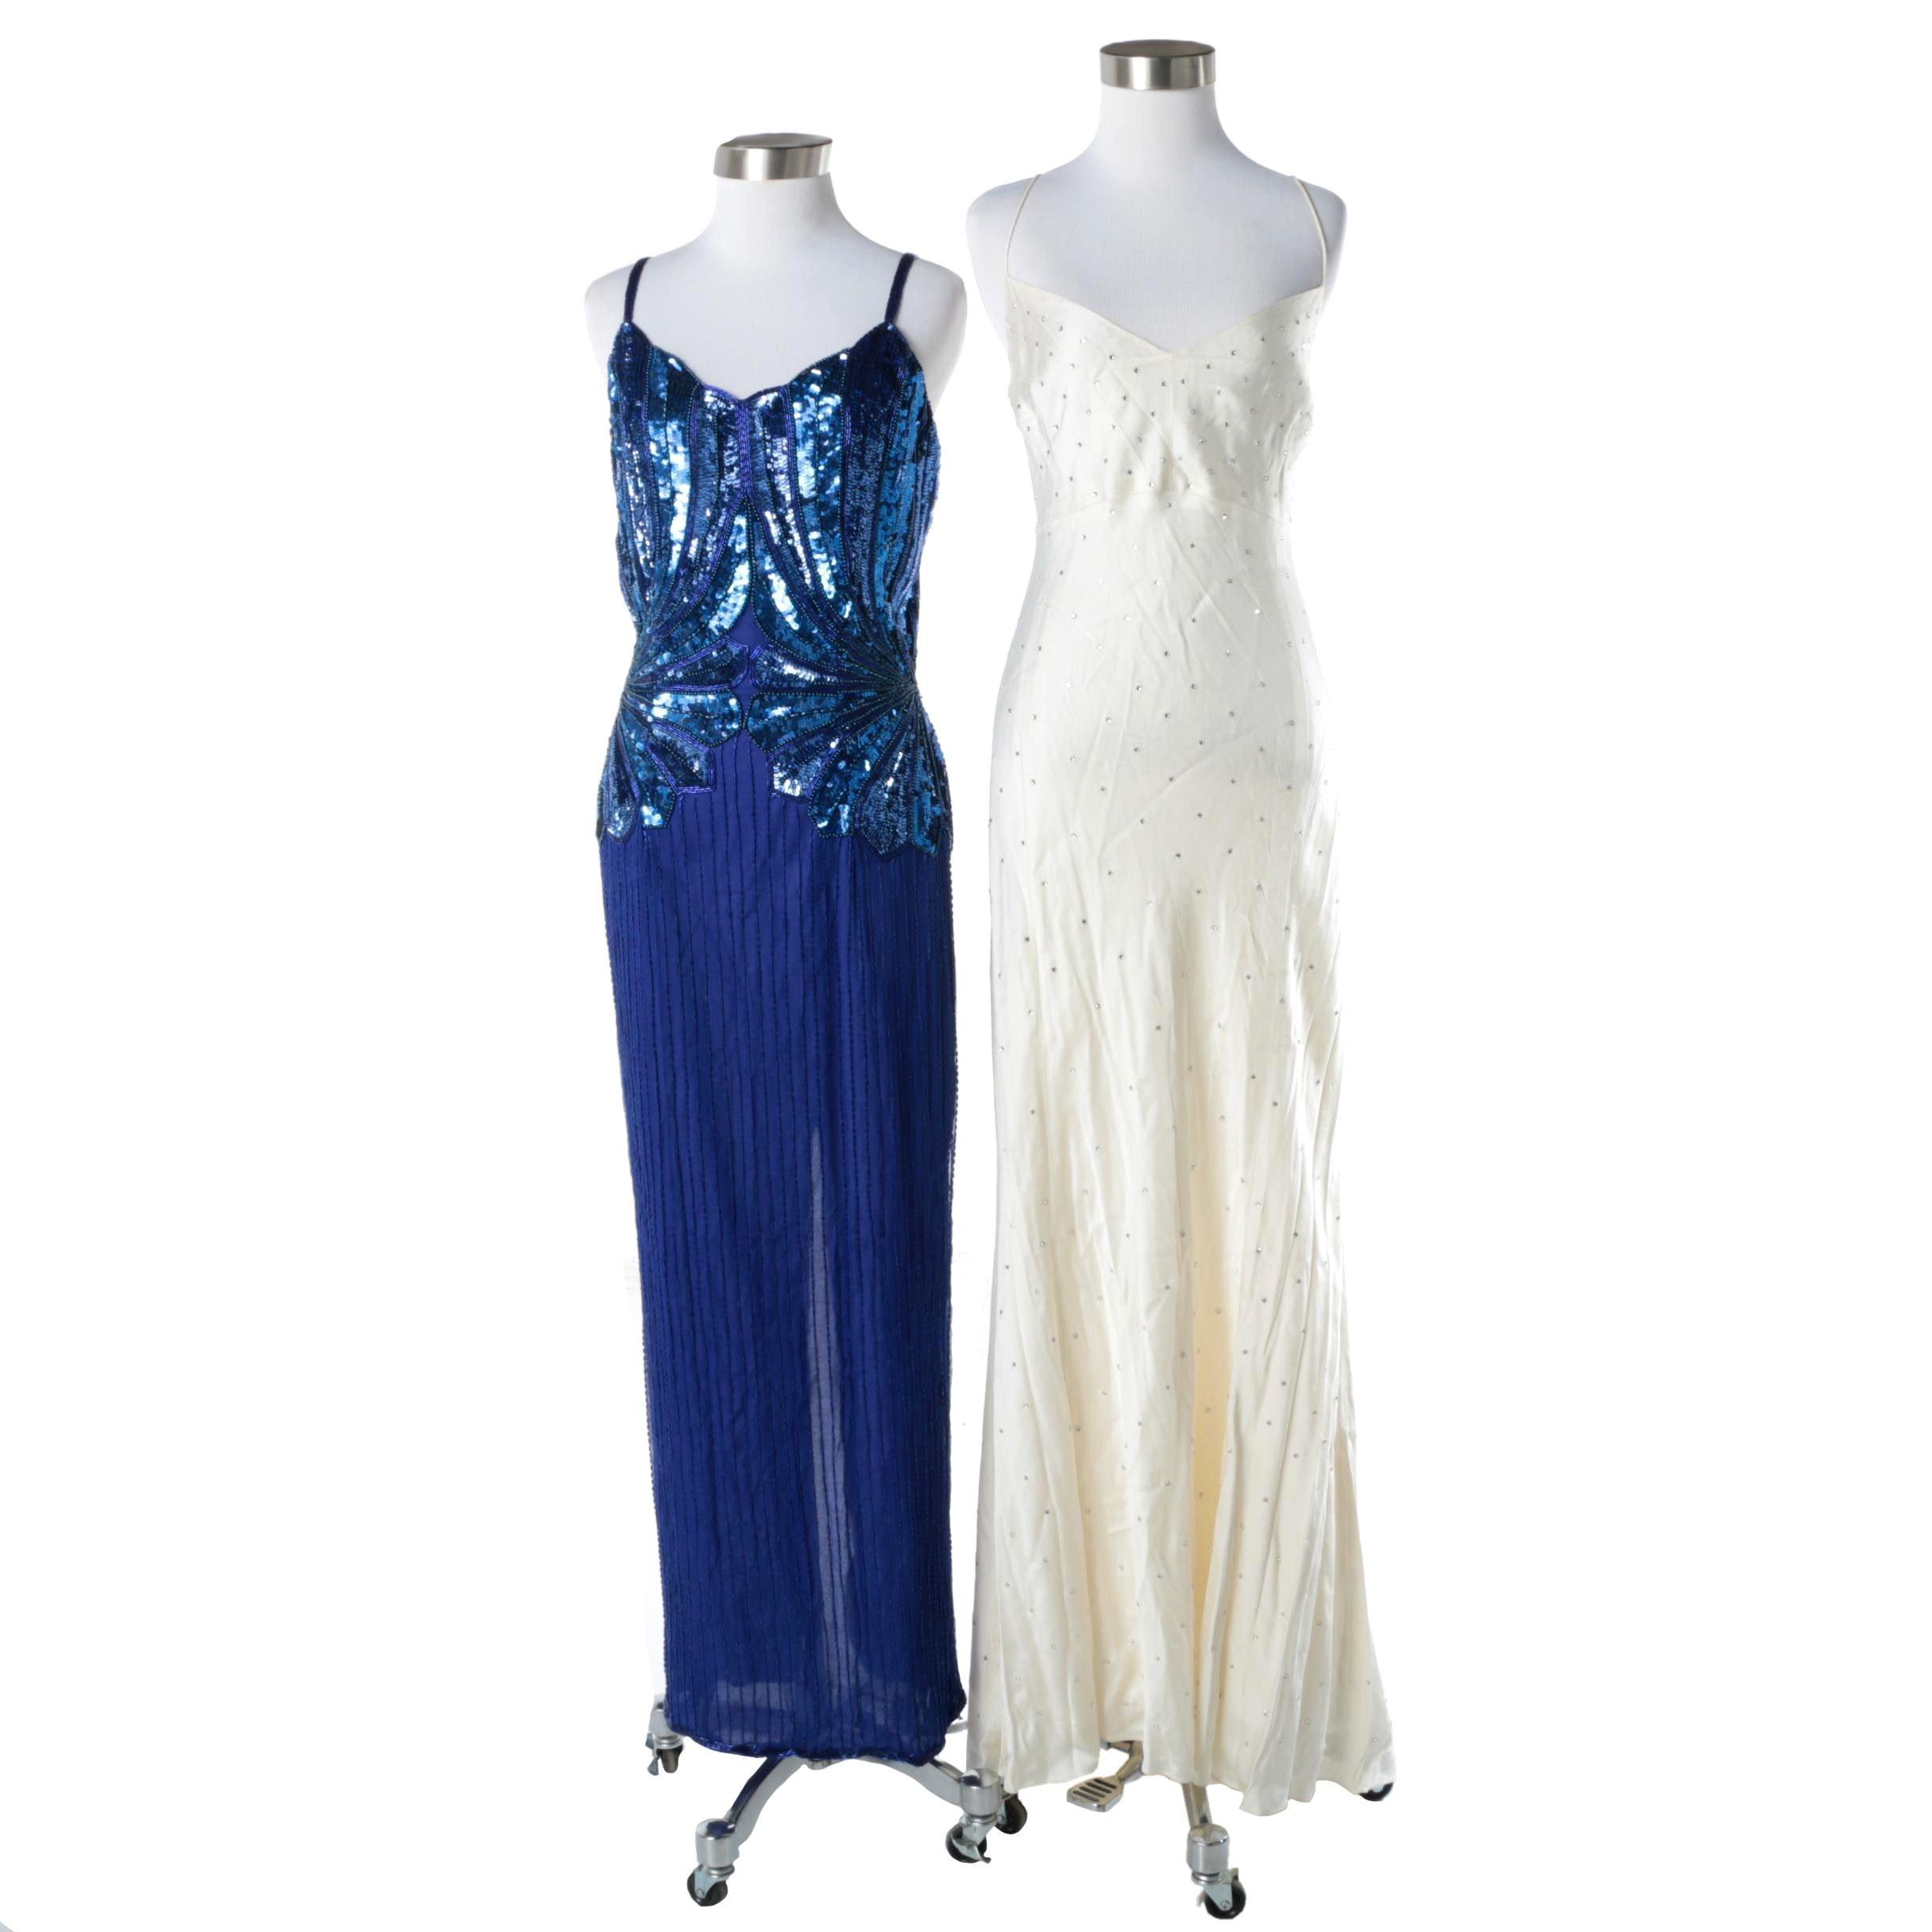 Embellished Full-Length Formal Gowns Including DKNY